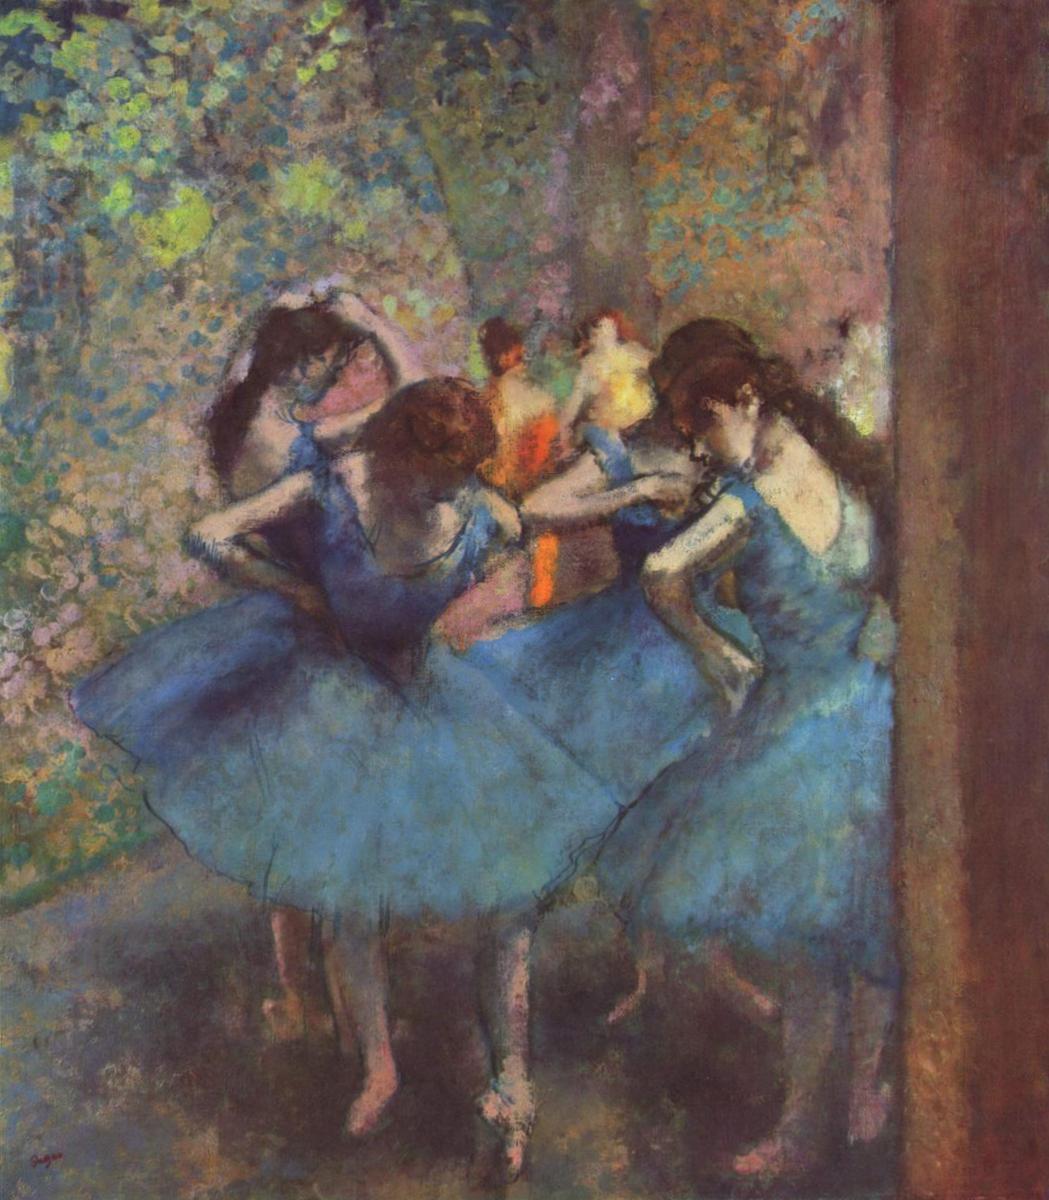 Голубые танцовщицы - Эдгар Дега (1881)